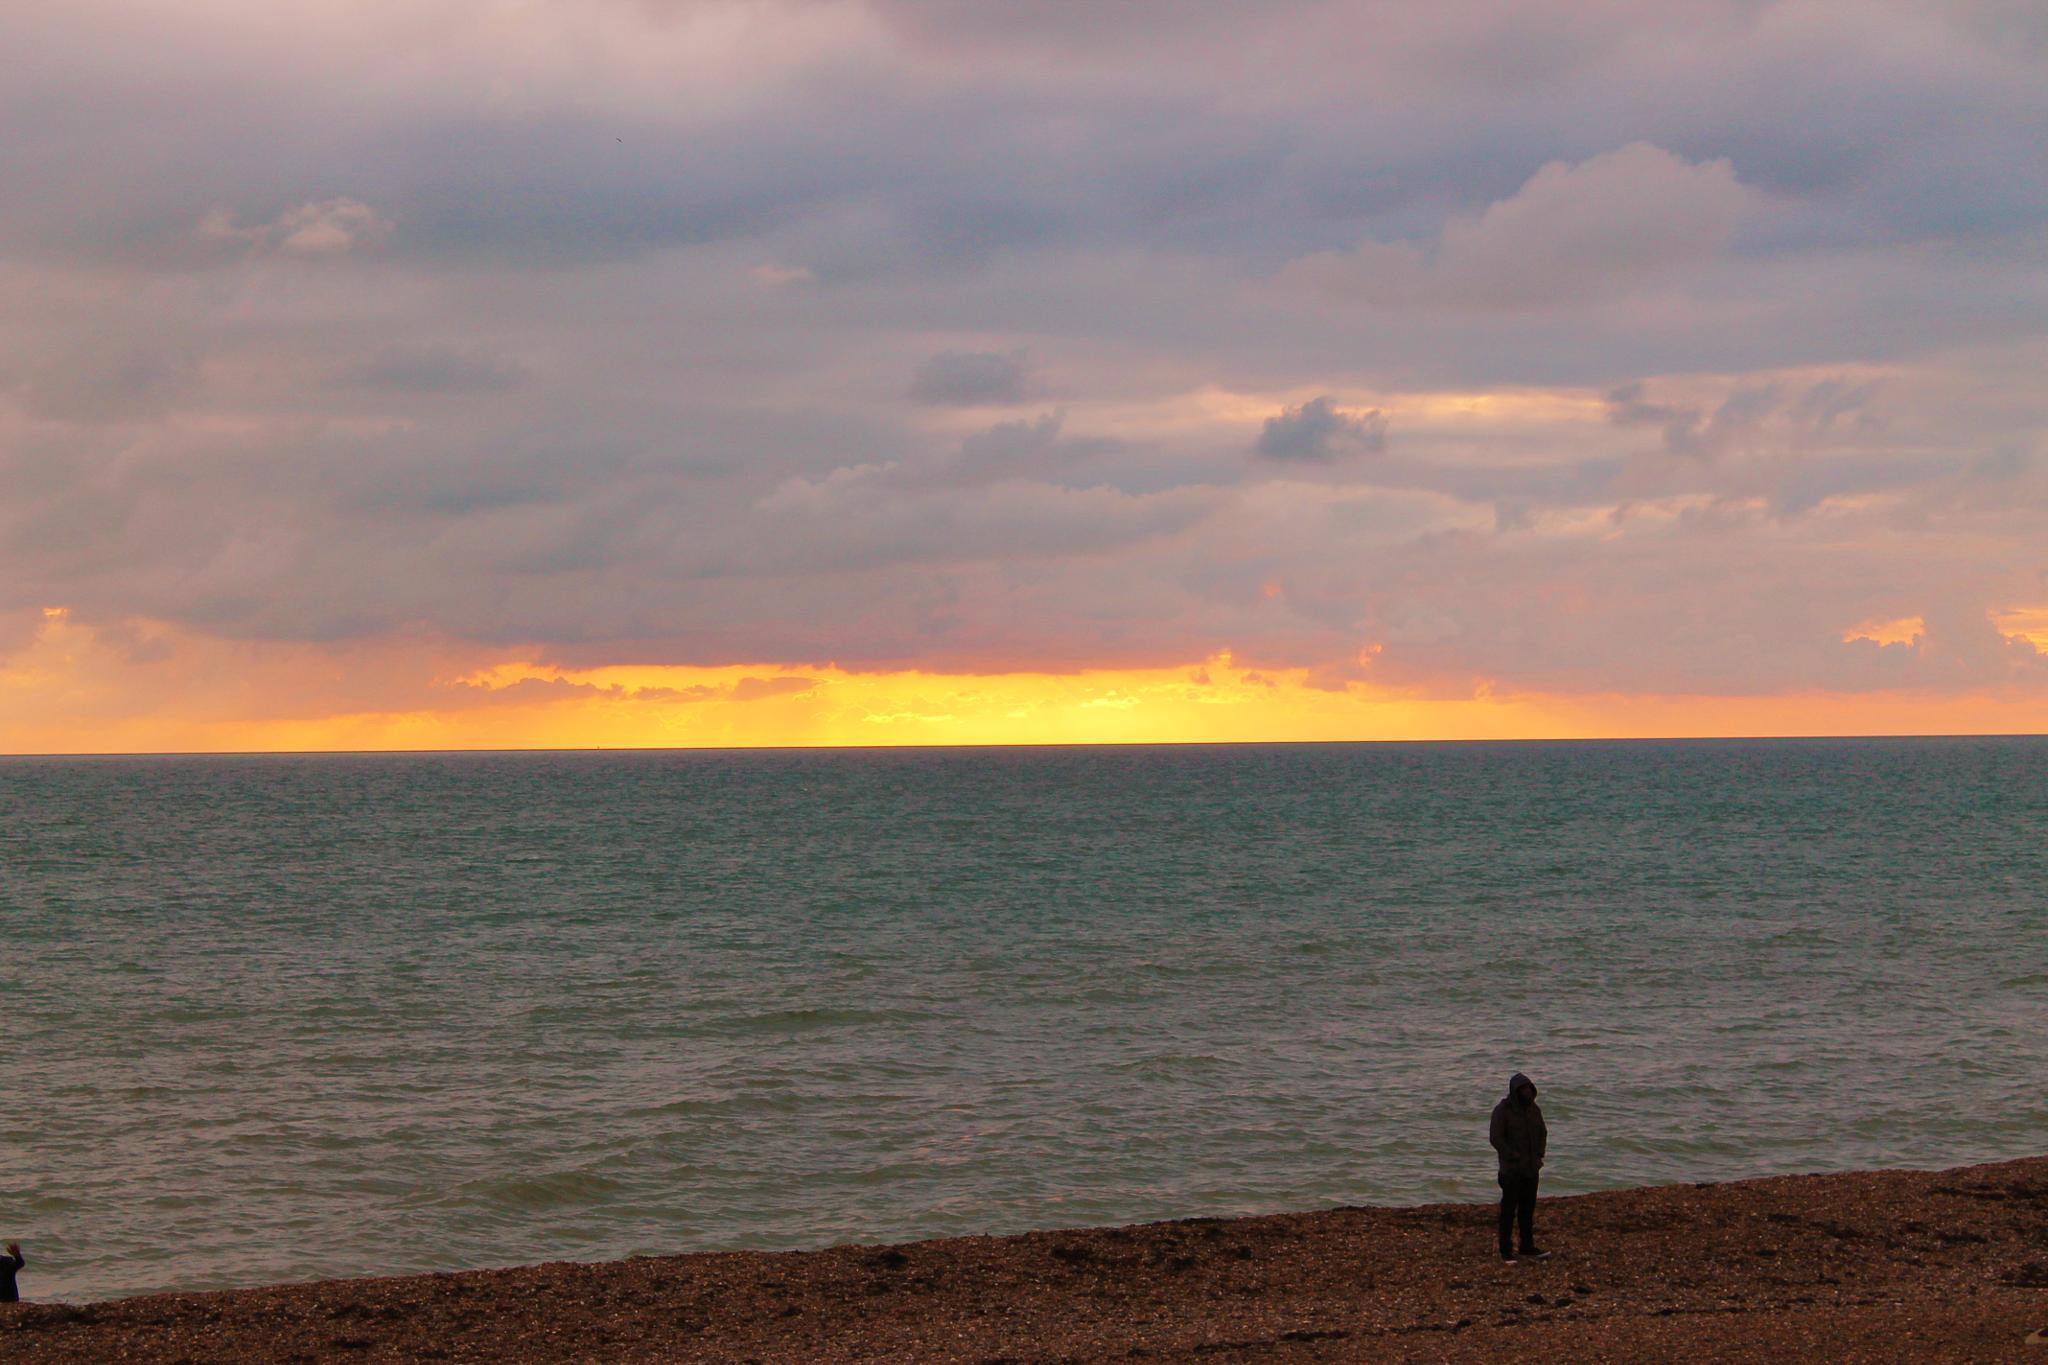 Brighton evening by tigra1988